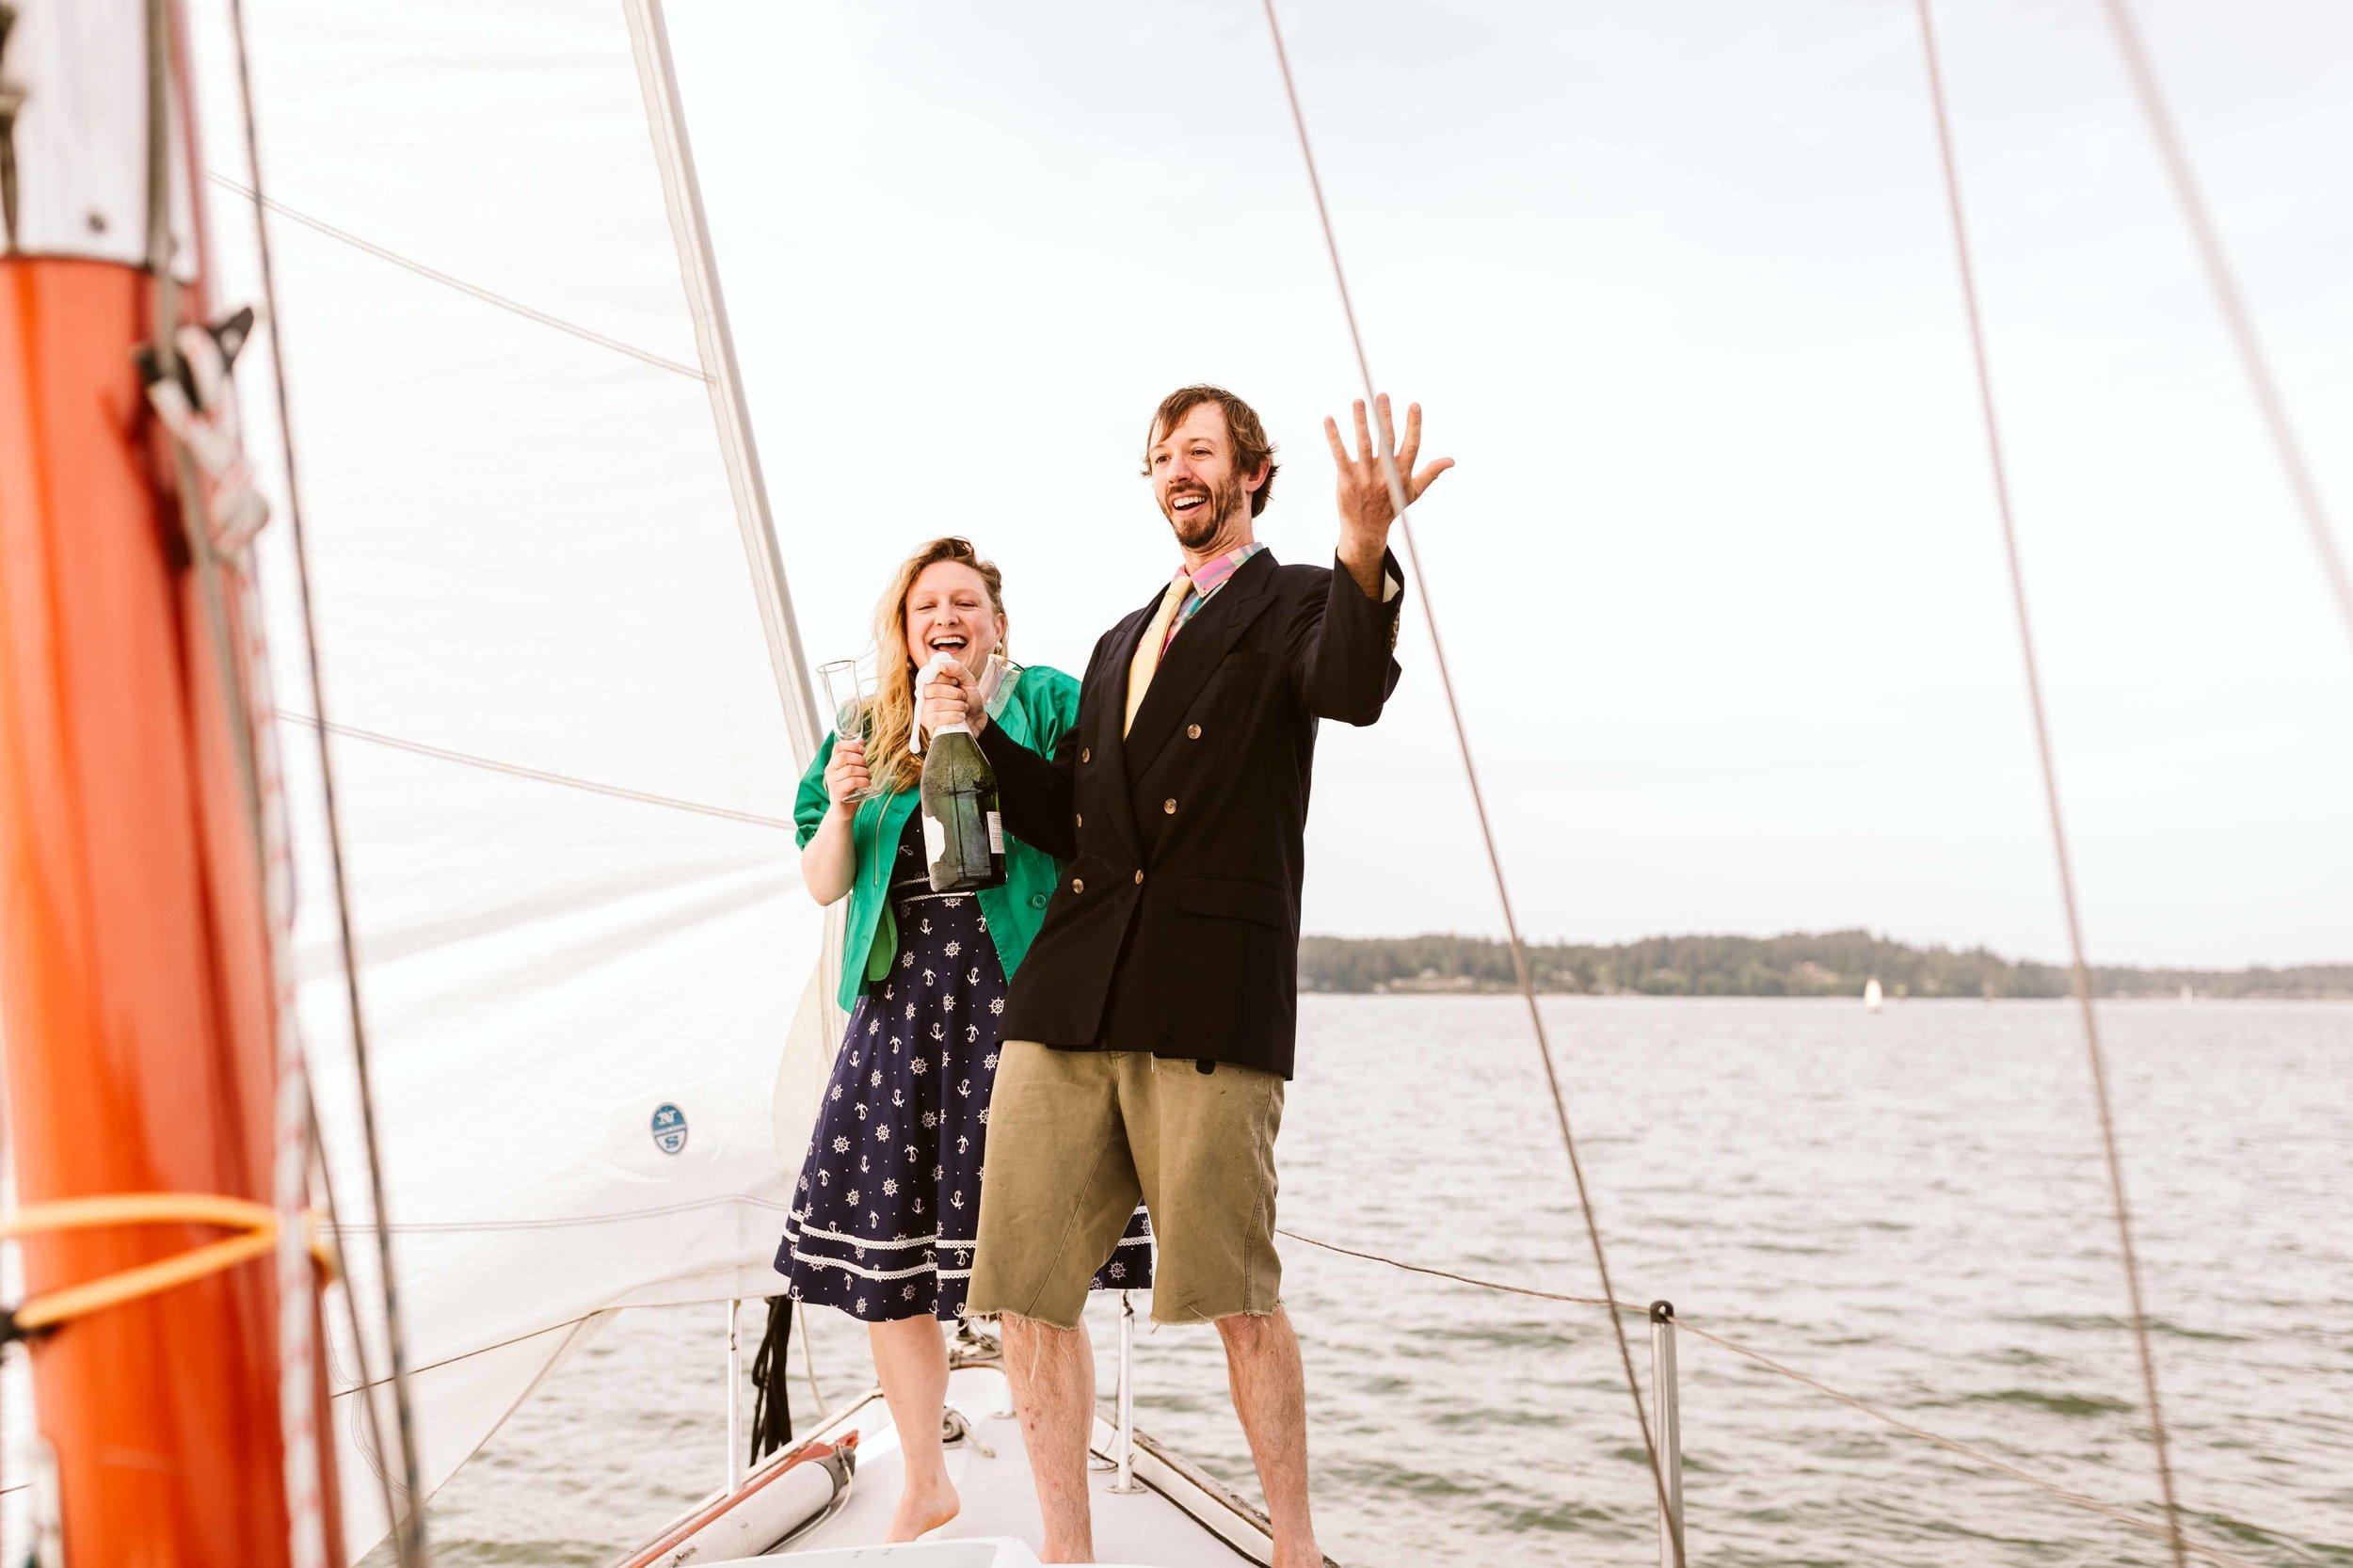 sailboat-engagement-photos-1.jpg